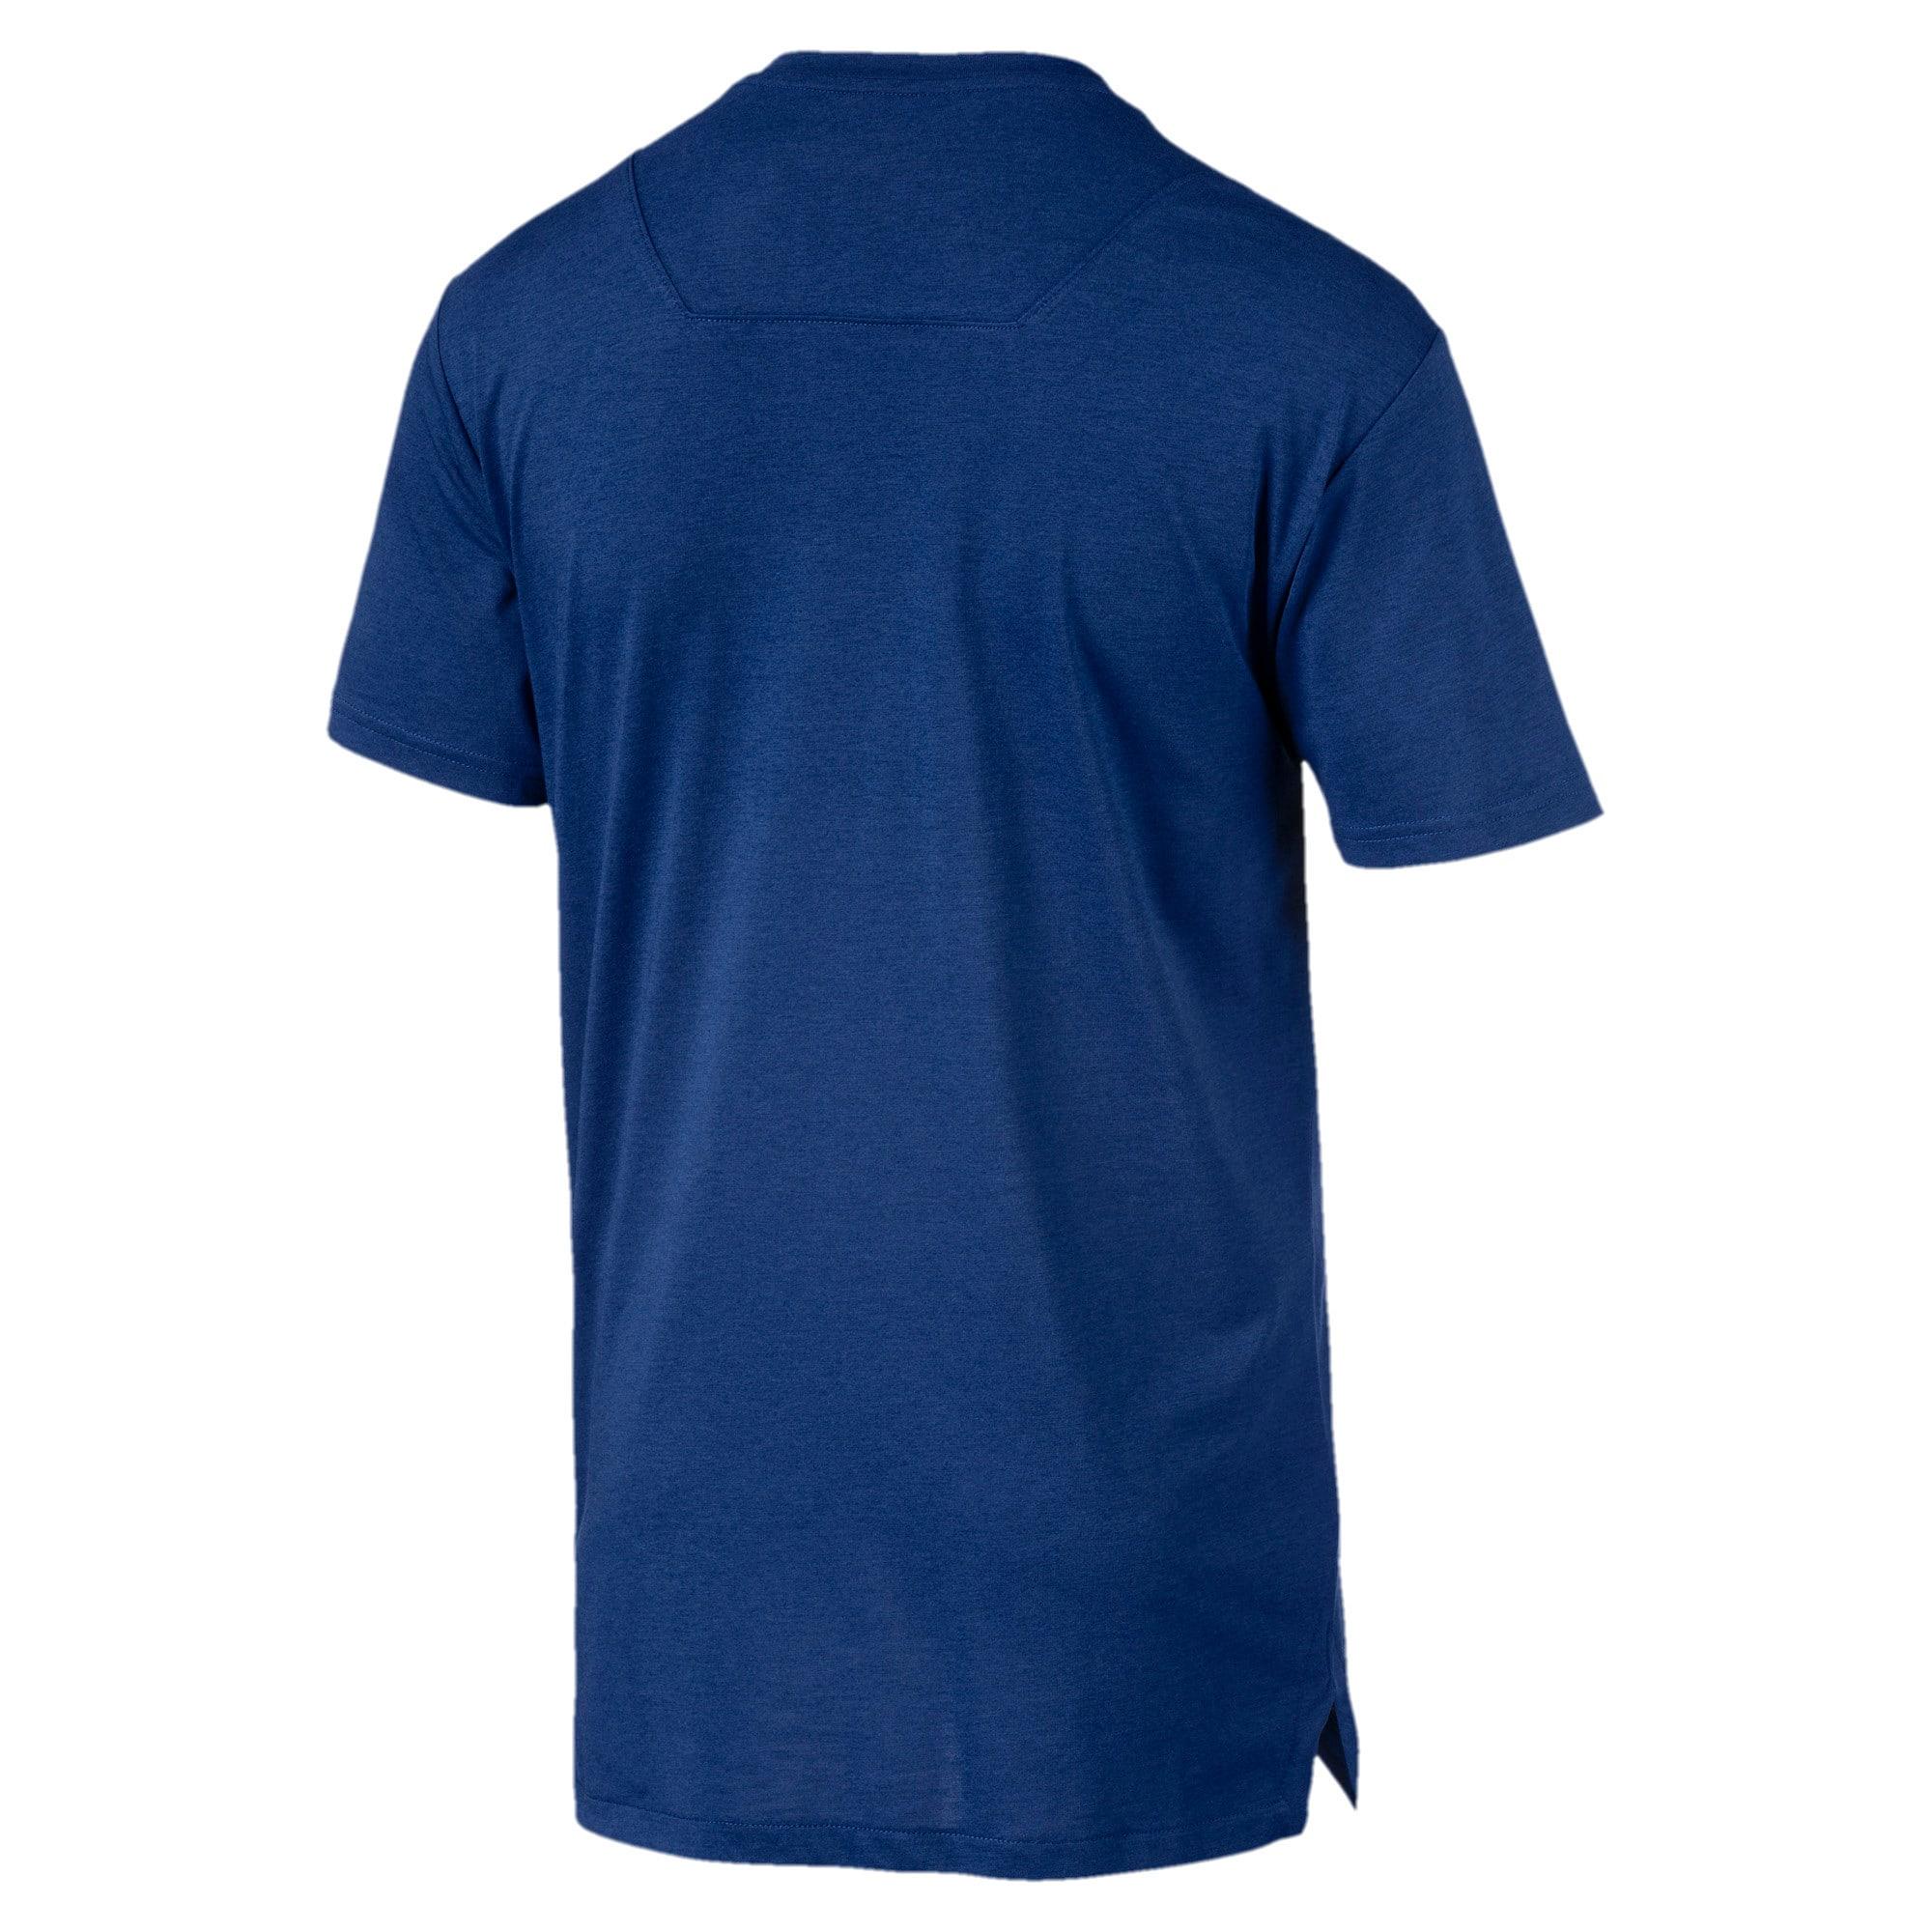 Thumbnail 5 of Energy Triblend Graphic Men's Running Tee, Sodalite Blue, medium-IND